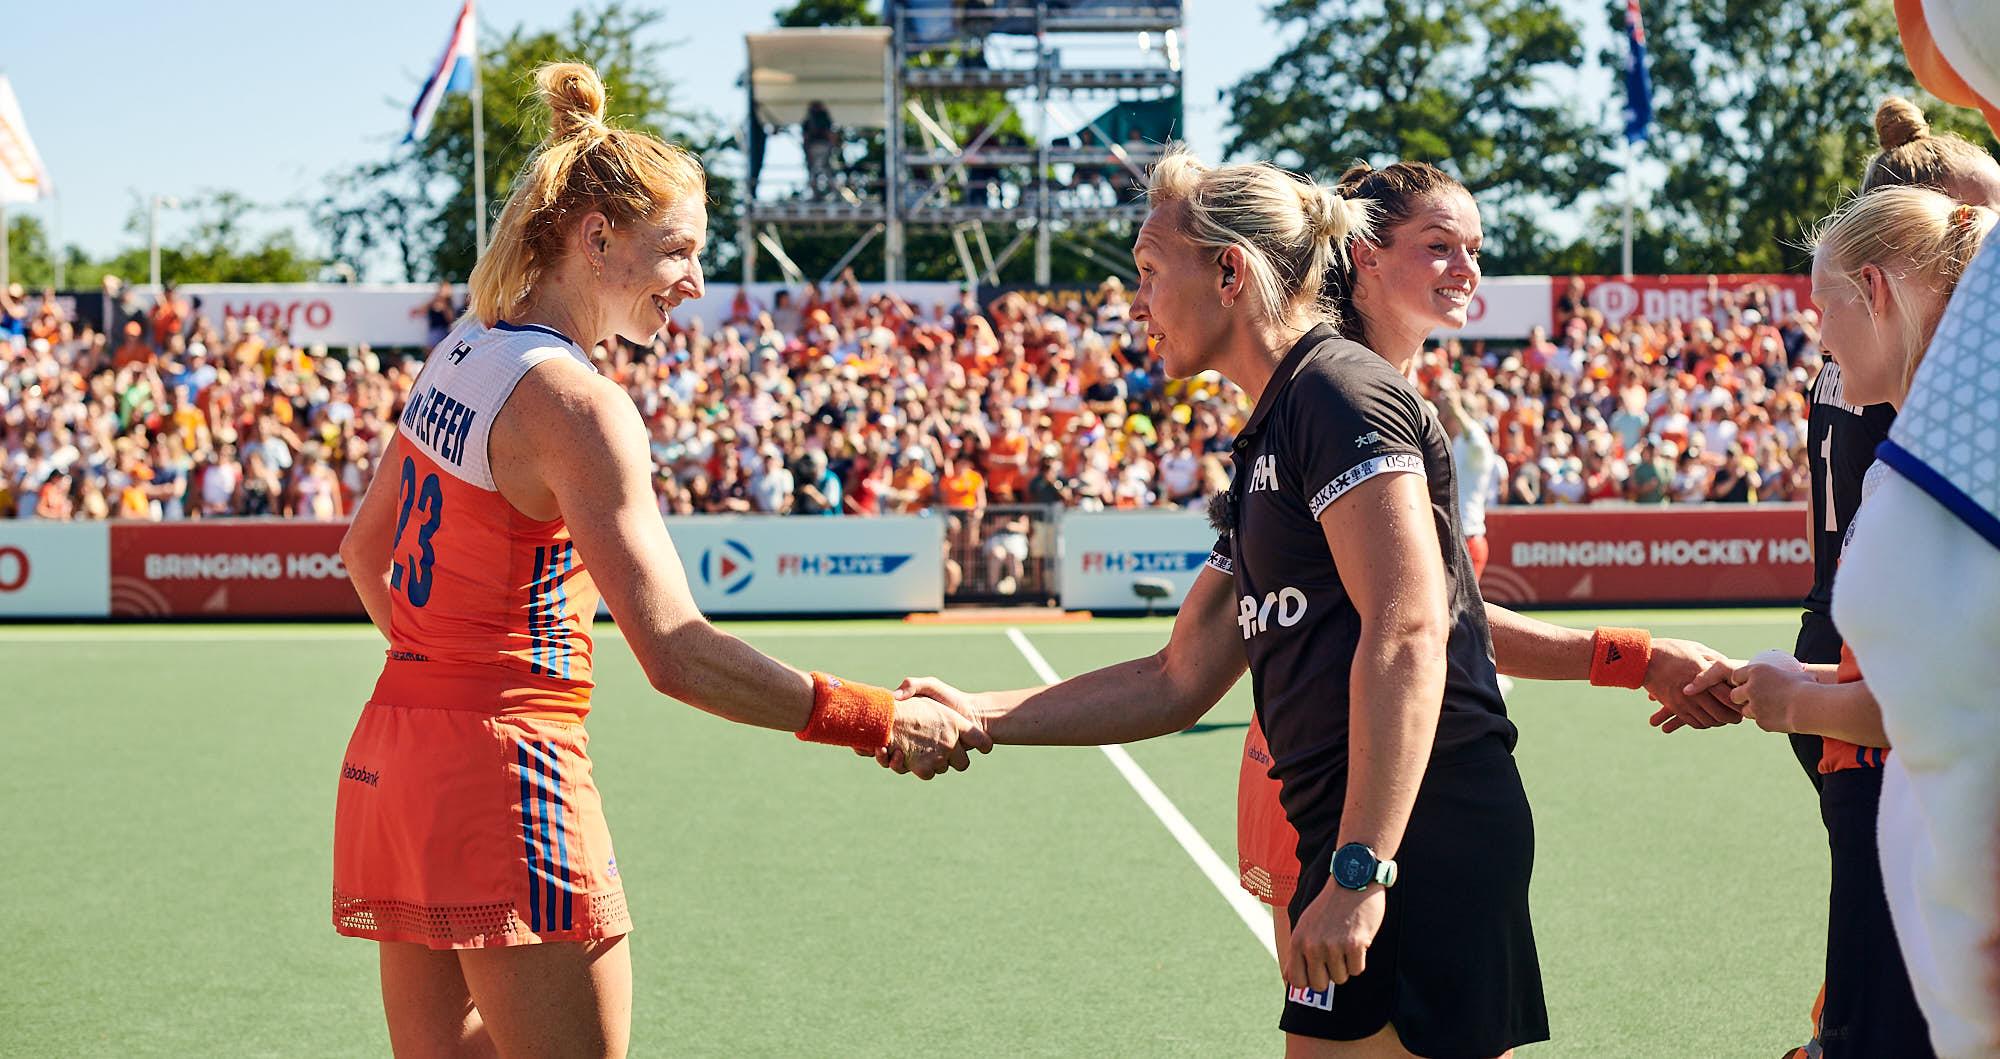 Margot van Geffen shaking a referee's hand during FIH Pro league finals in Amsterdam